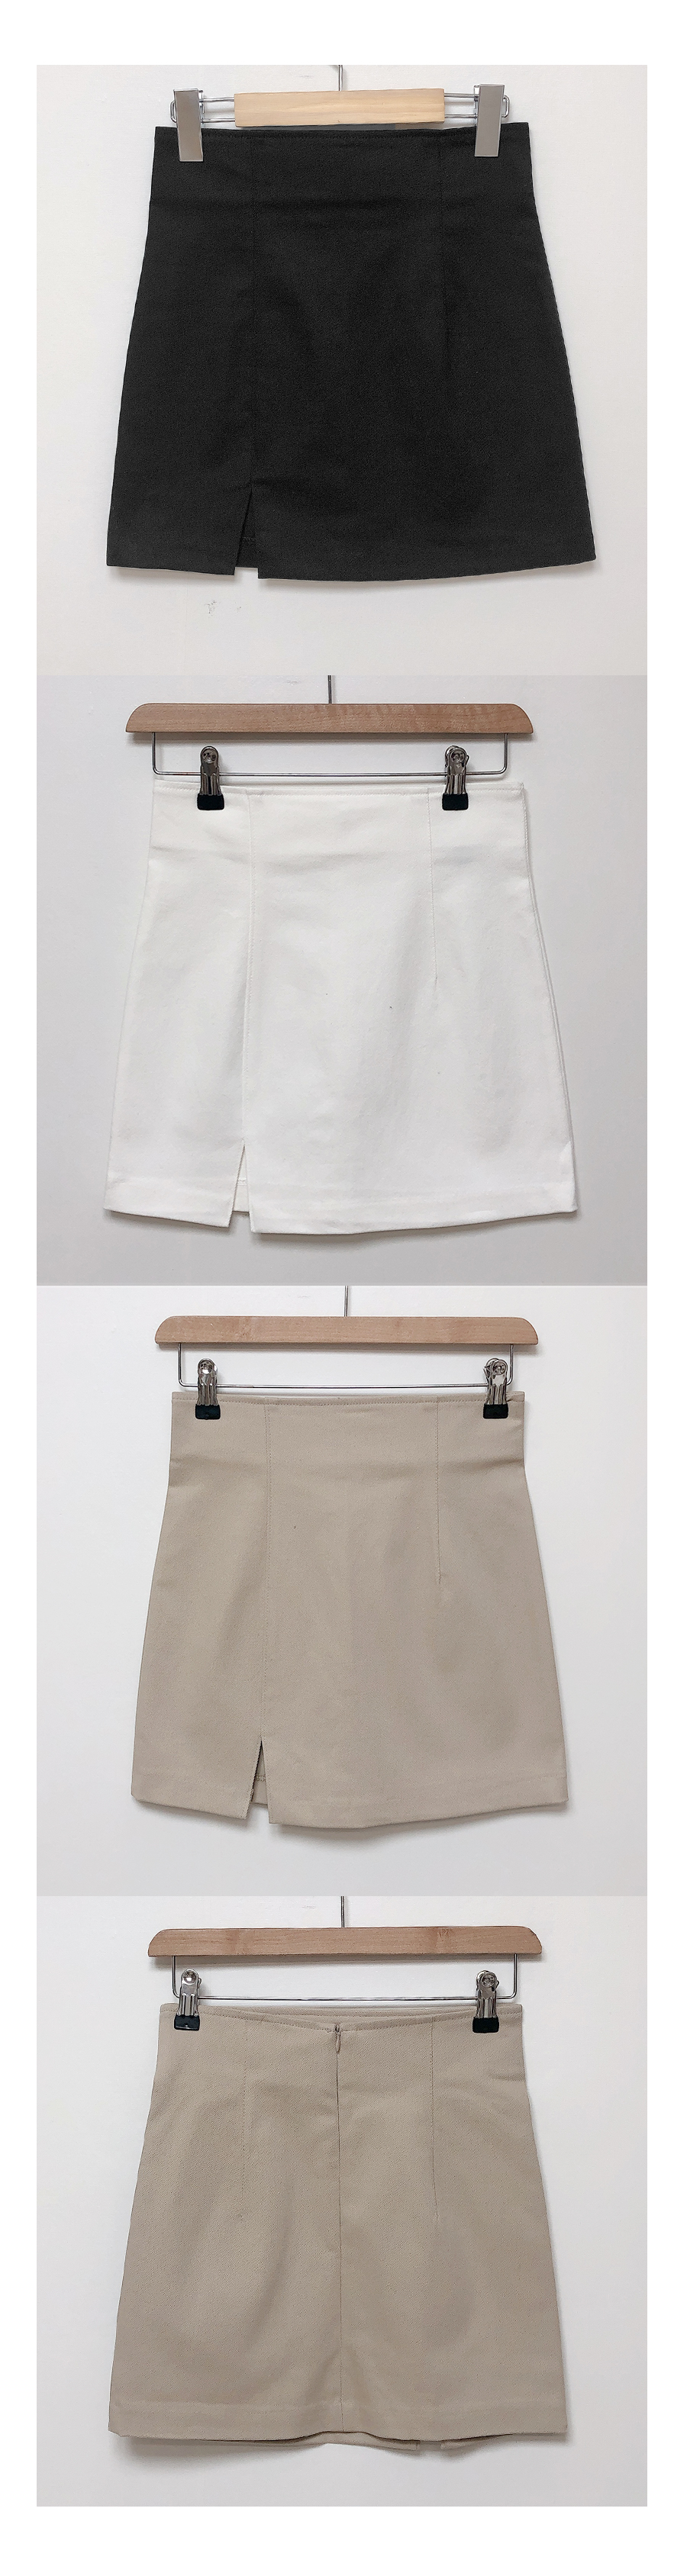 Humming Trim Mini Skirt